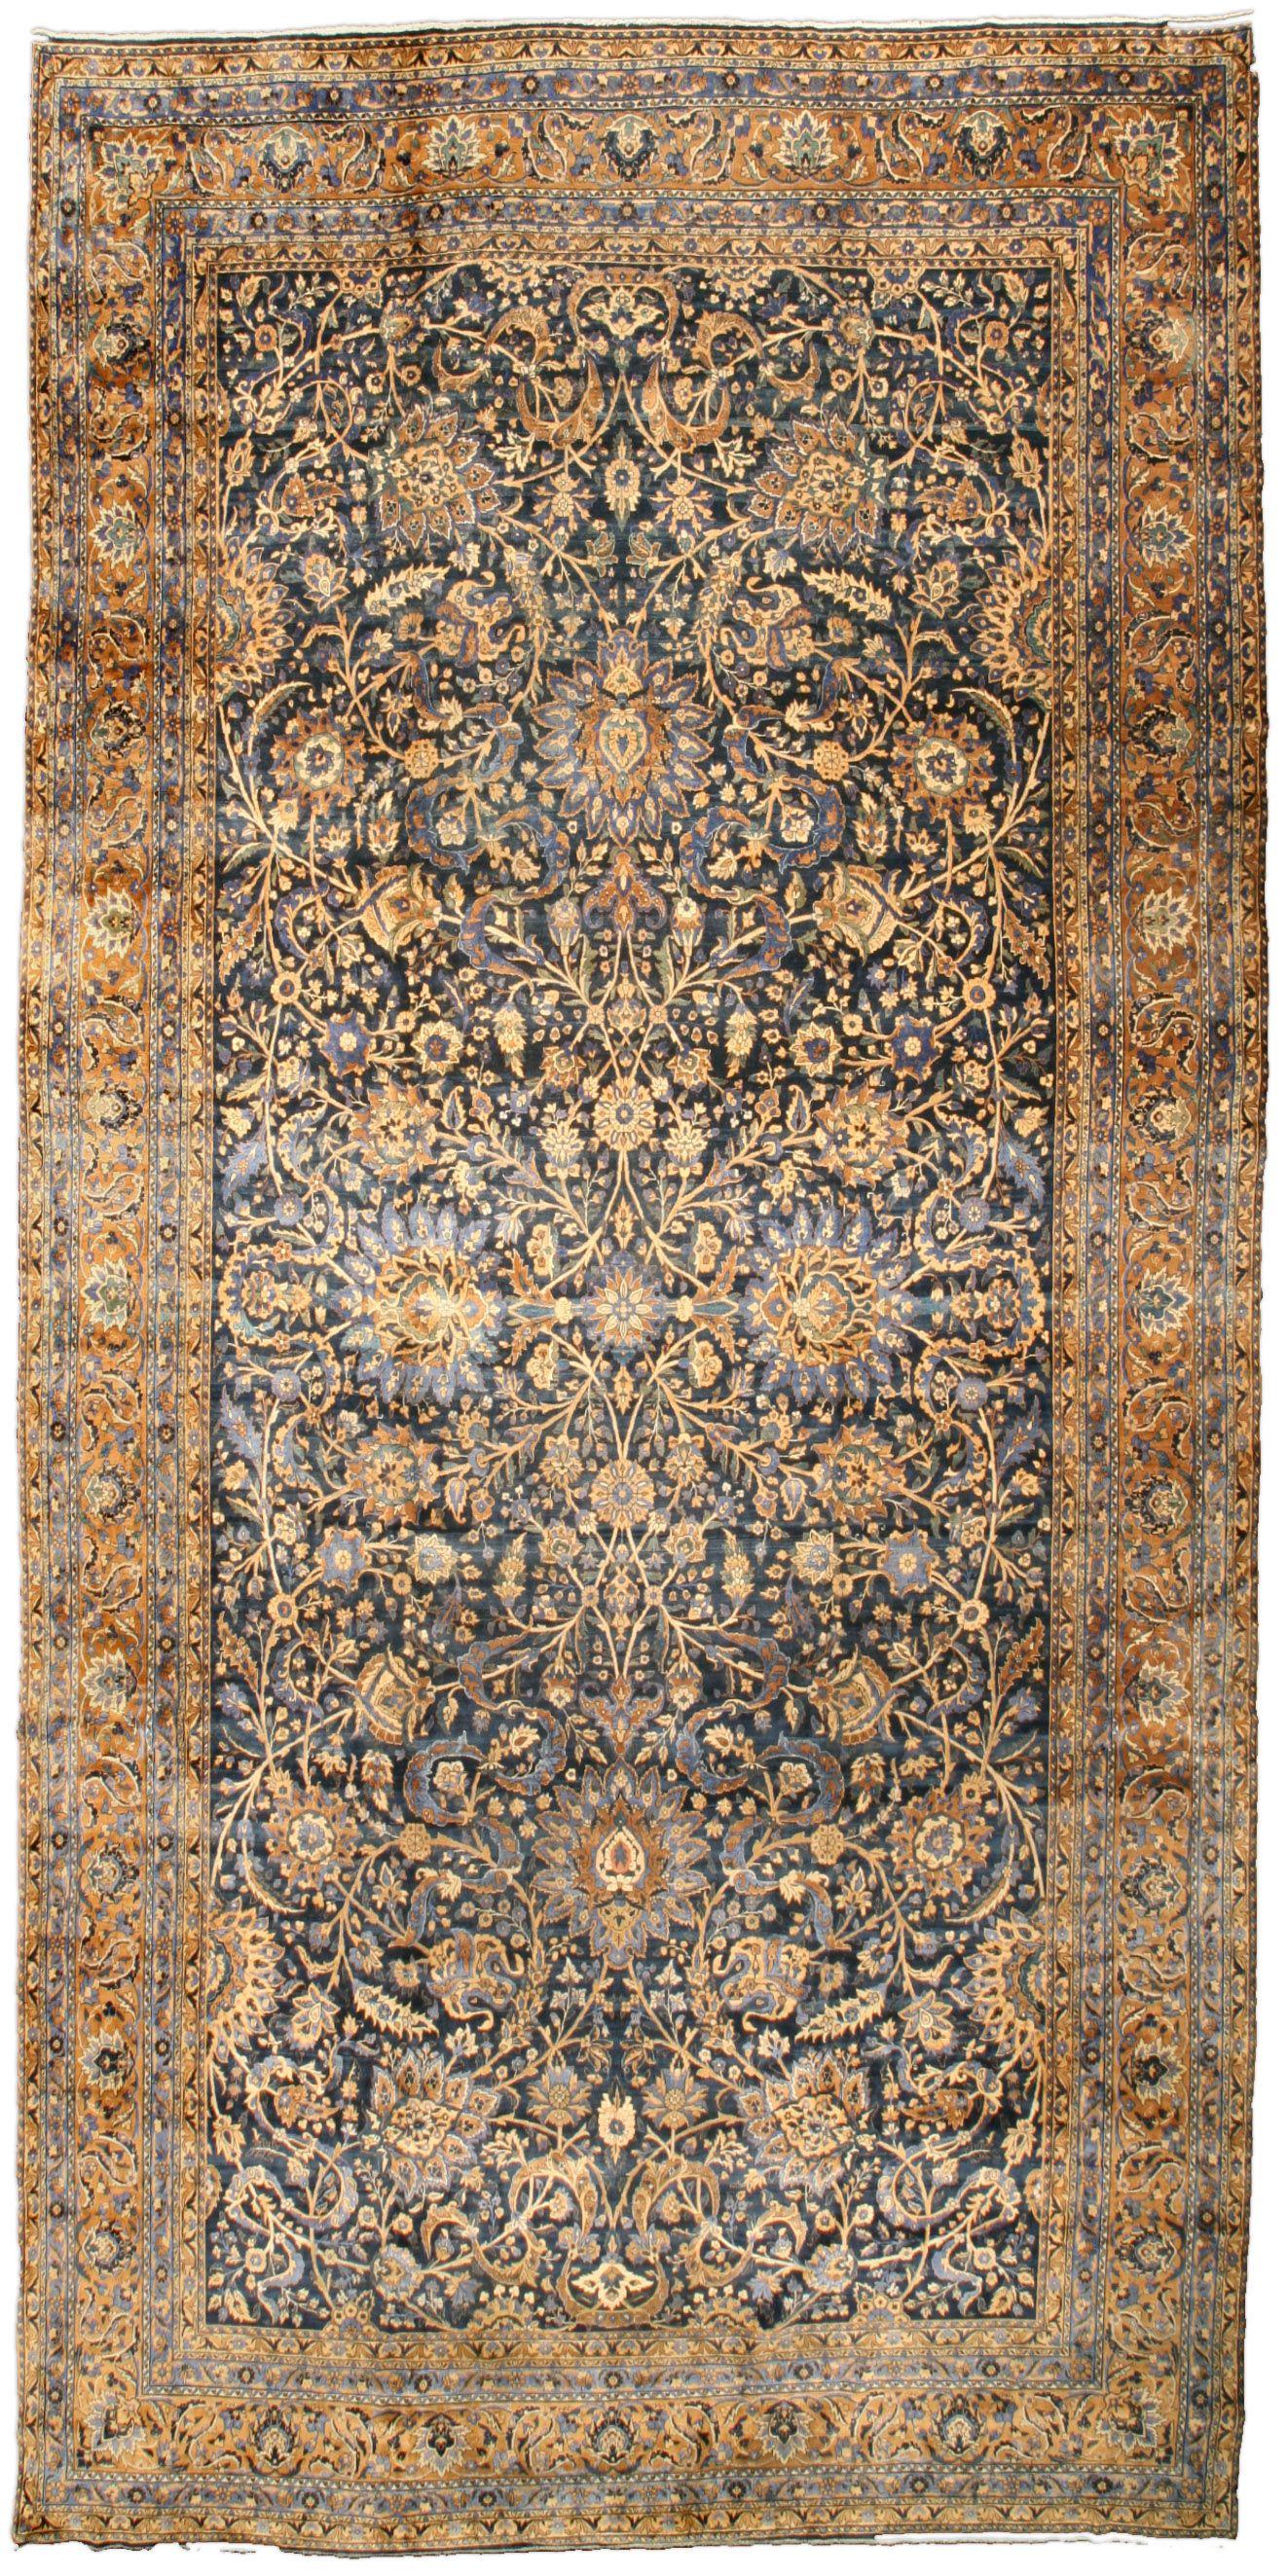 Antique Persian Kirman Rug Rugs Rugs On Carpet Carpet